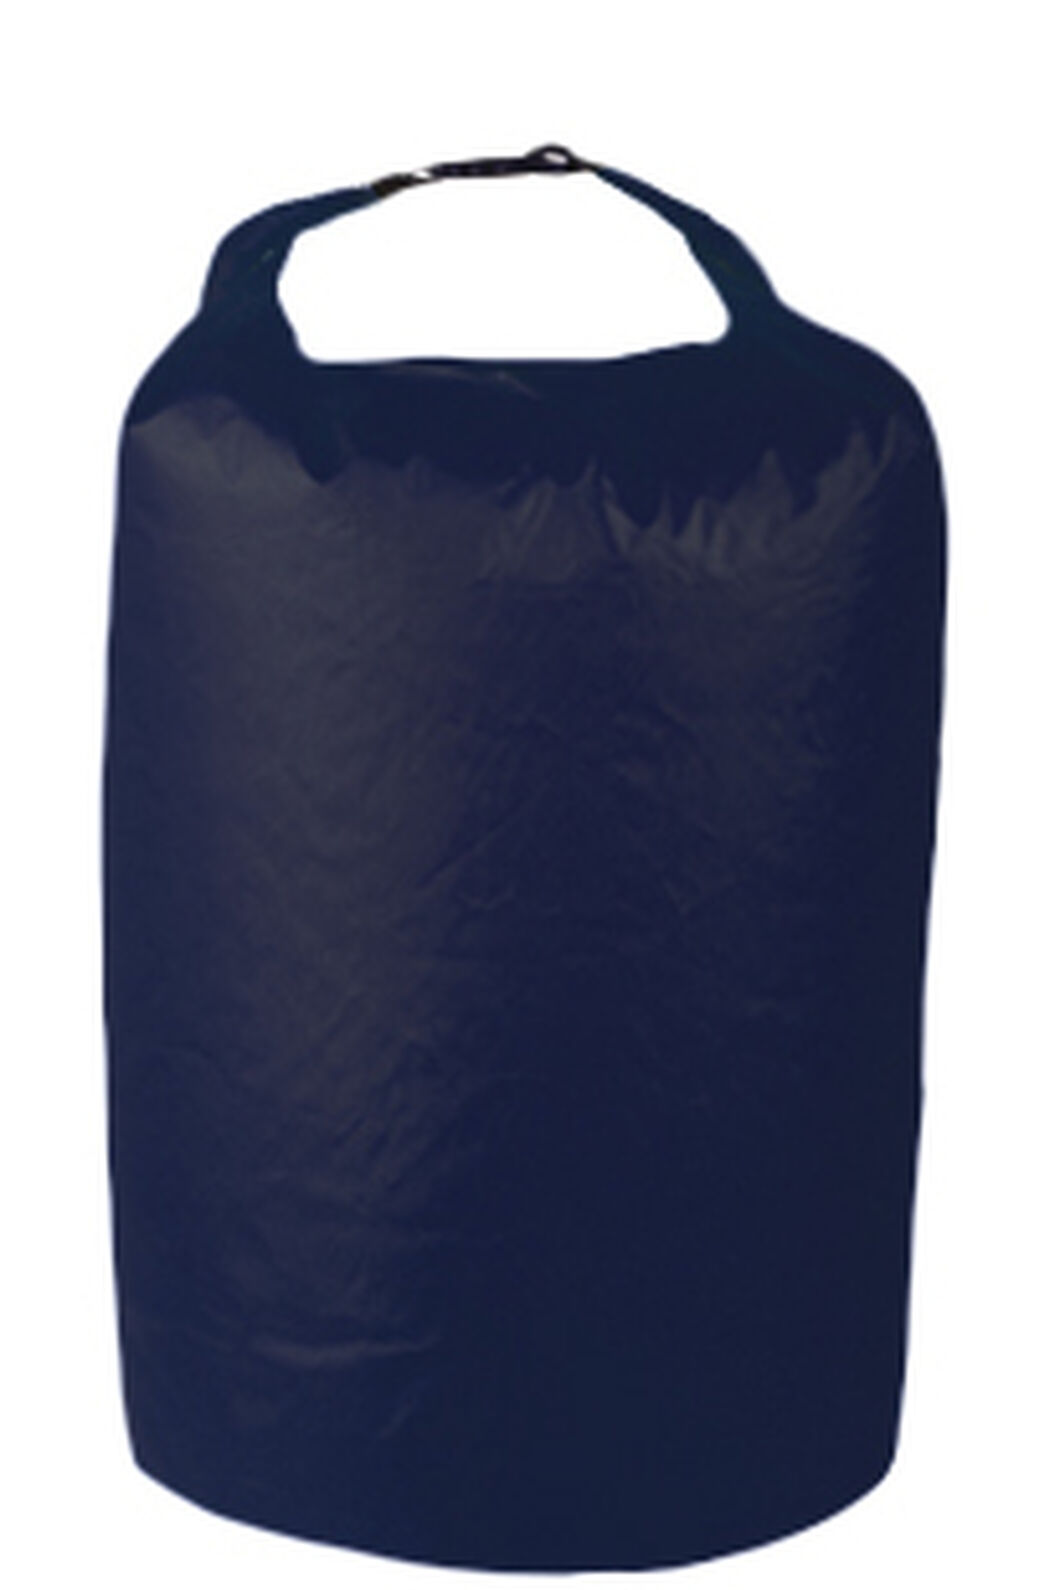 Macpac Ultralight Dry Bag 30 L, Sodalite Blue, hi-res